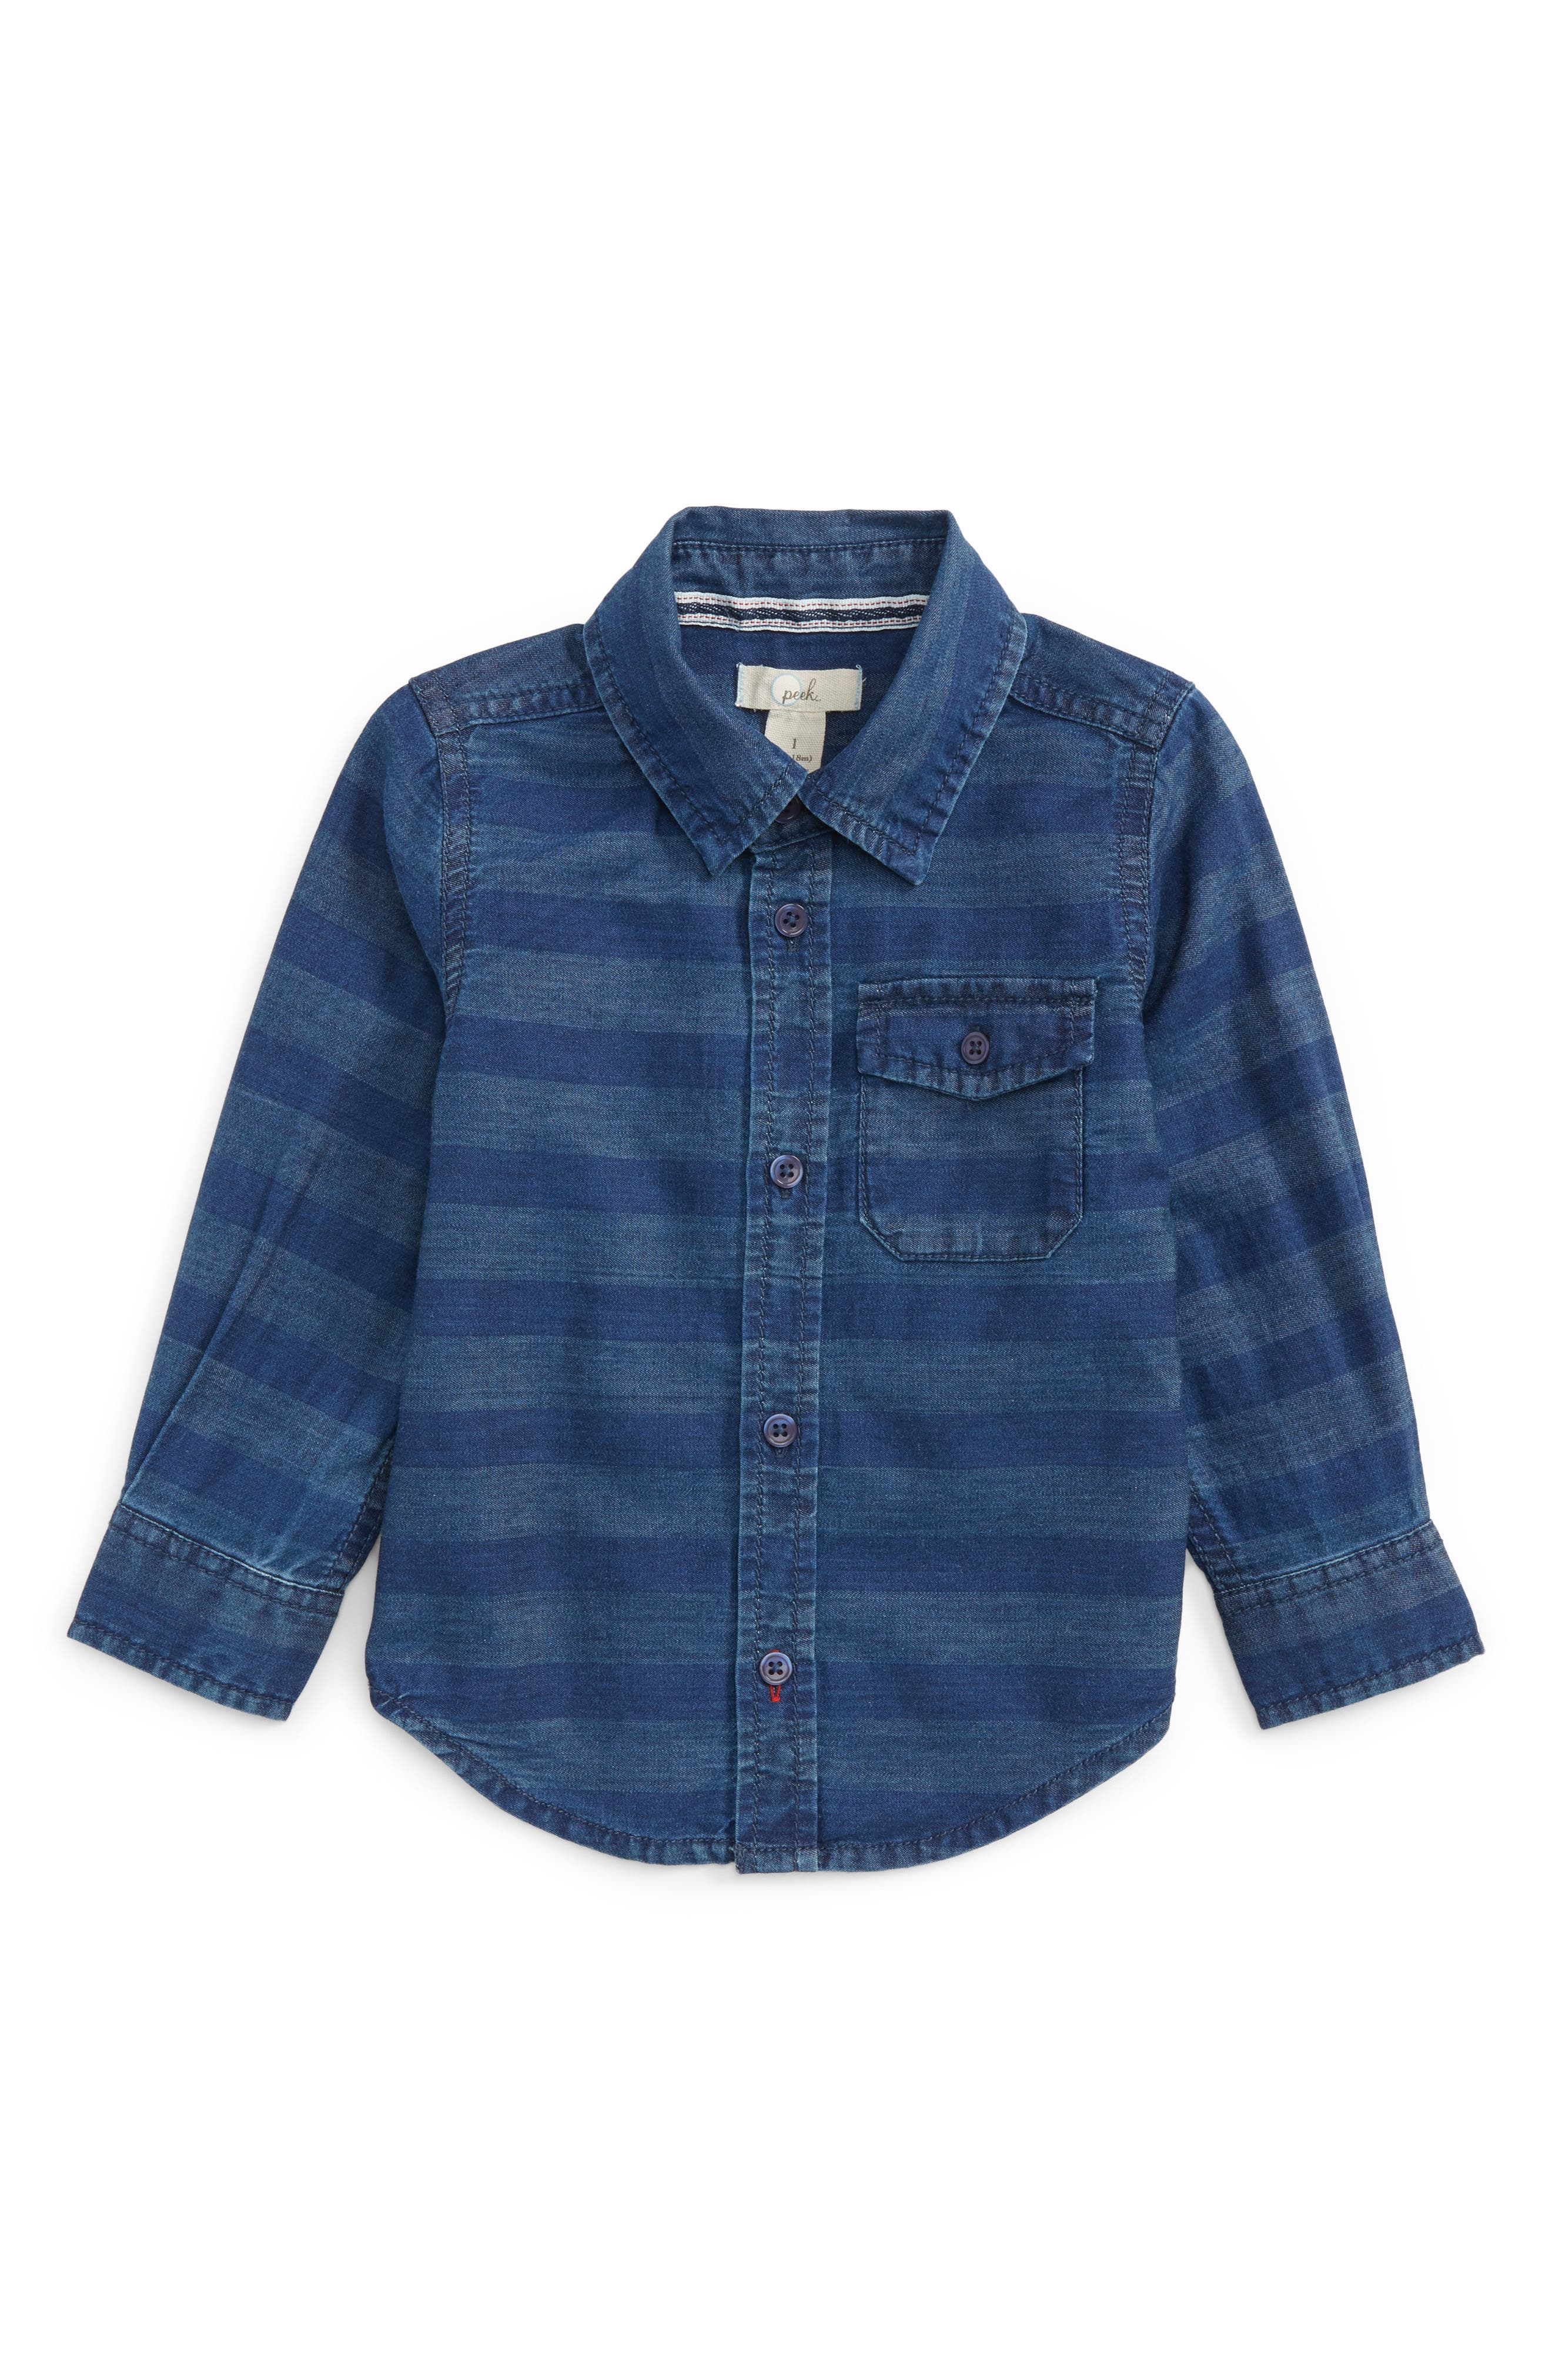 Aiden Stripe Chambray Shirt,                             Main thumbnail 1, color,                             402